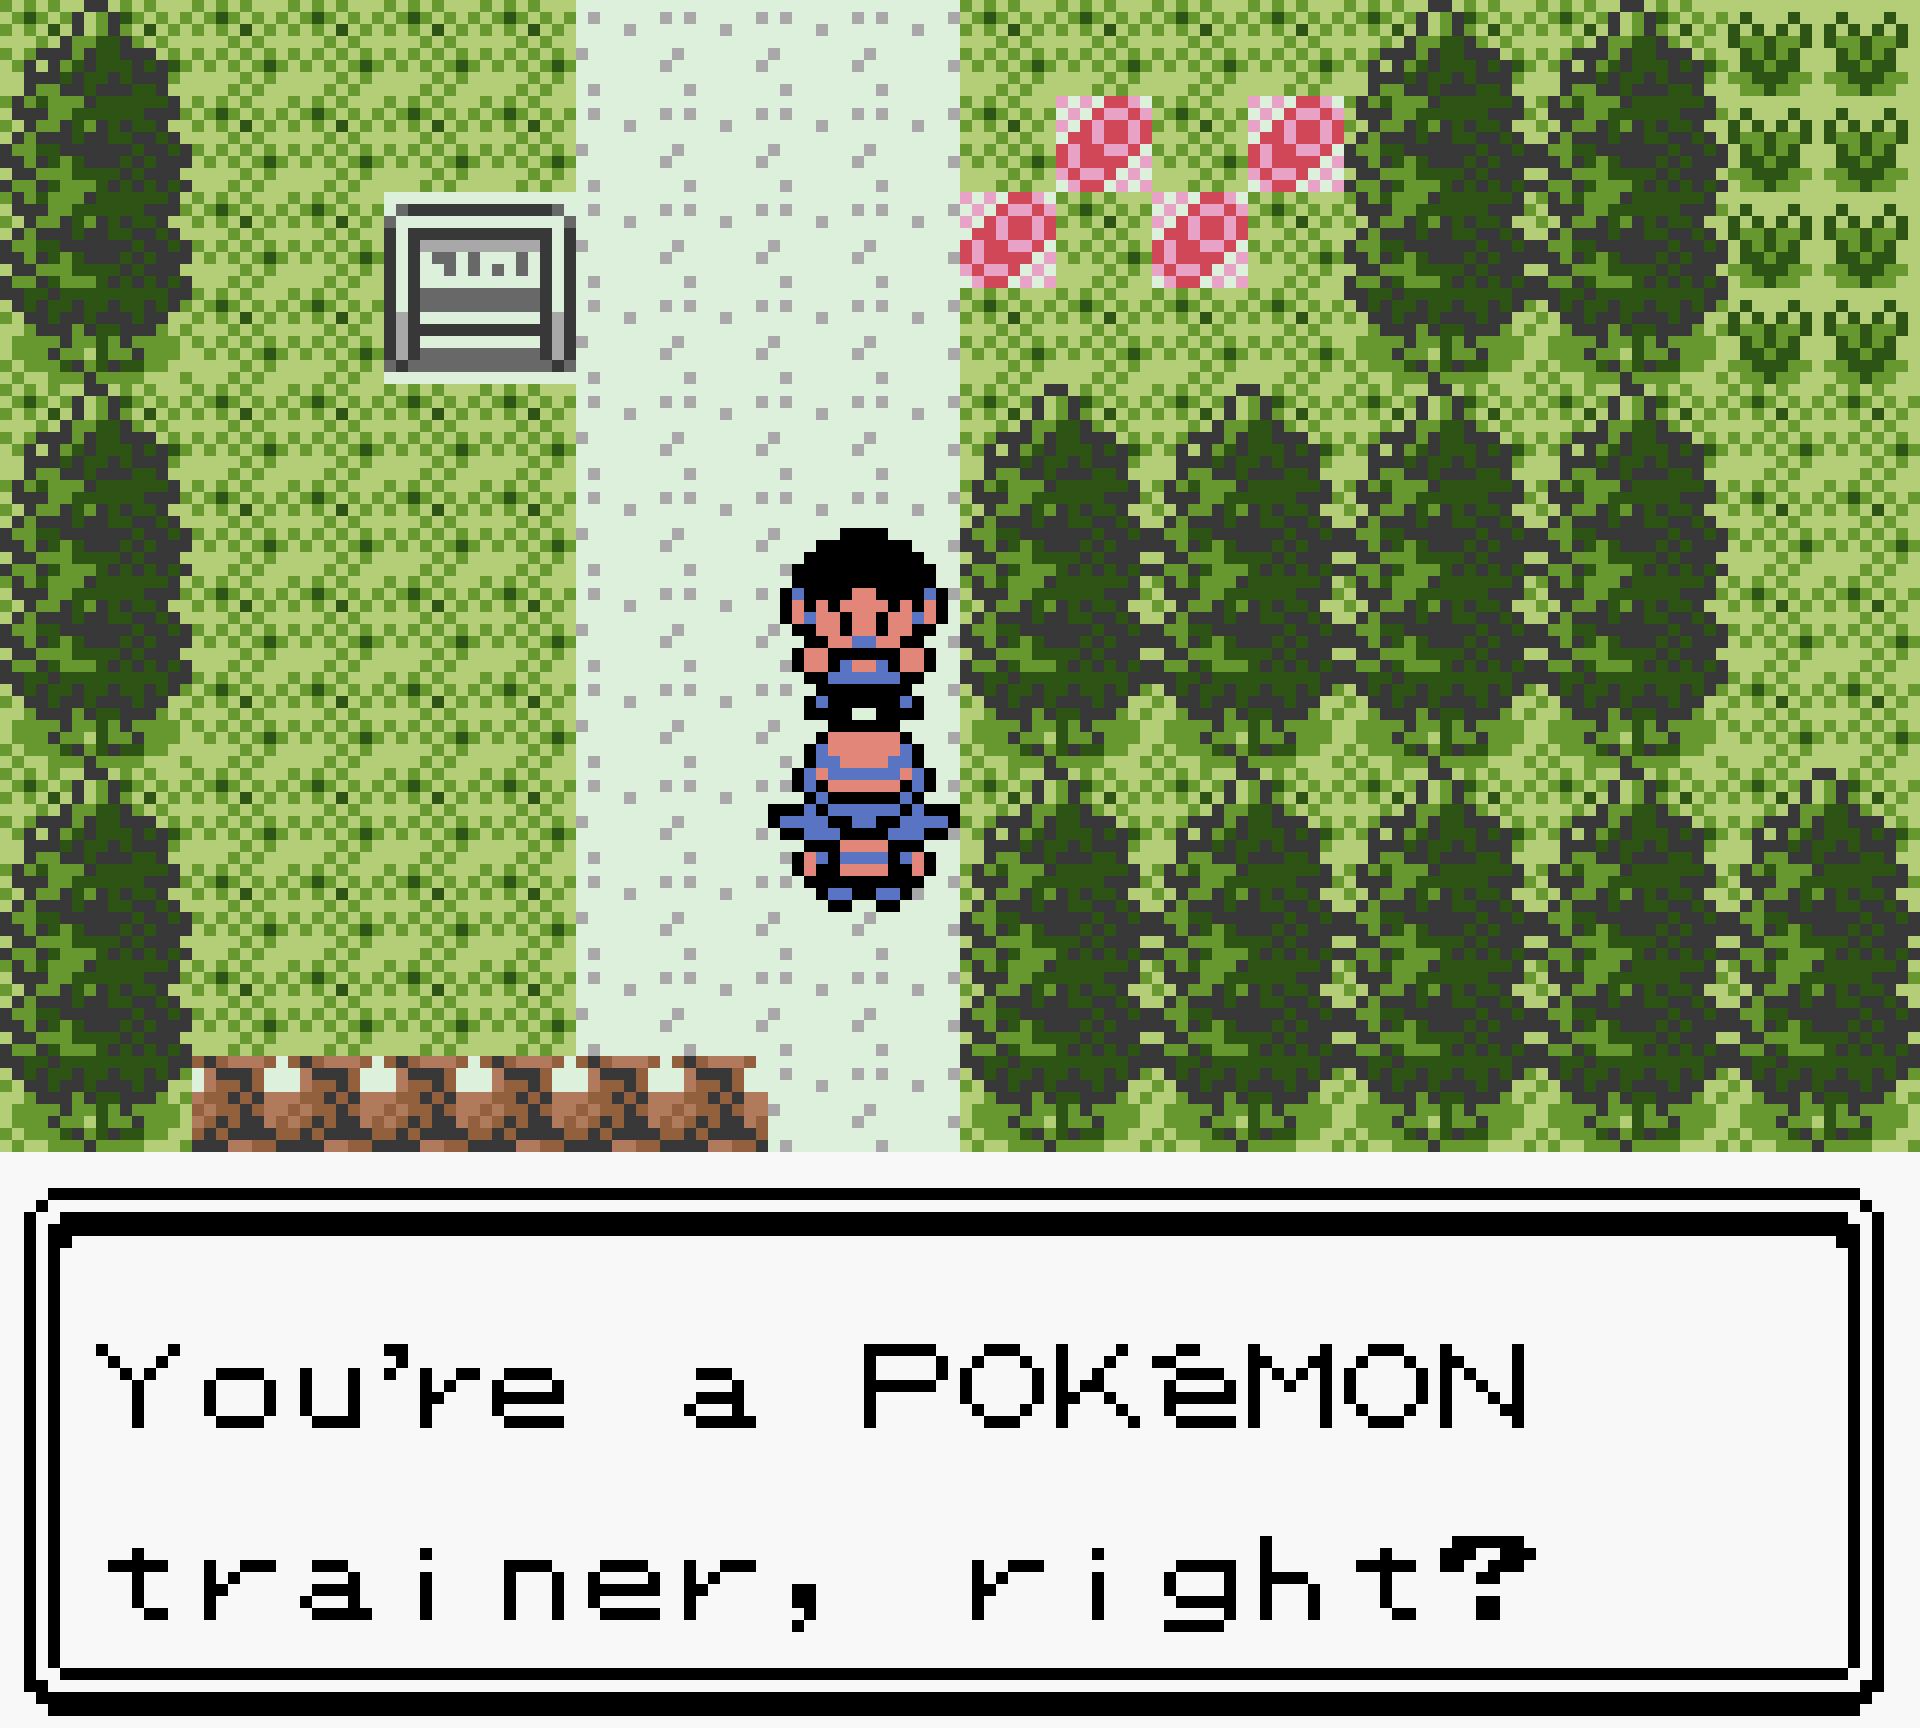 Pokemon_Crystal_Nuzlocke_2021-10-14_16.51.49.png